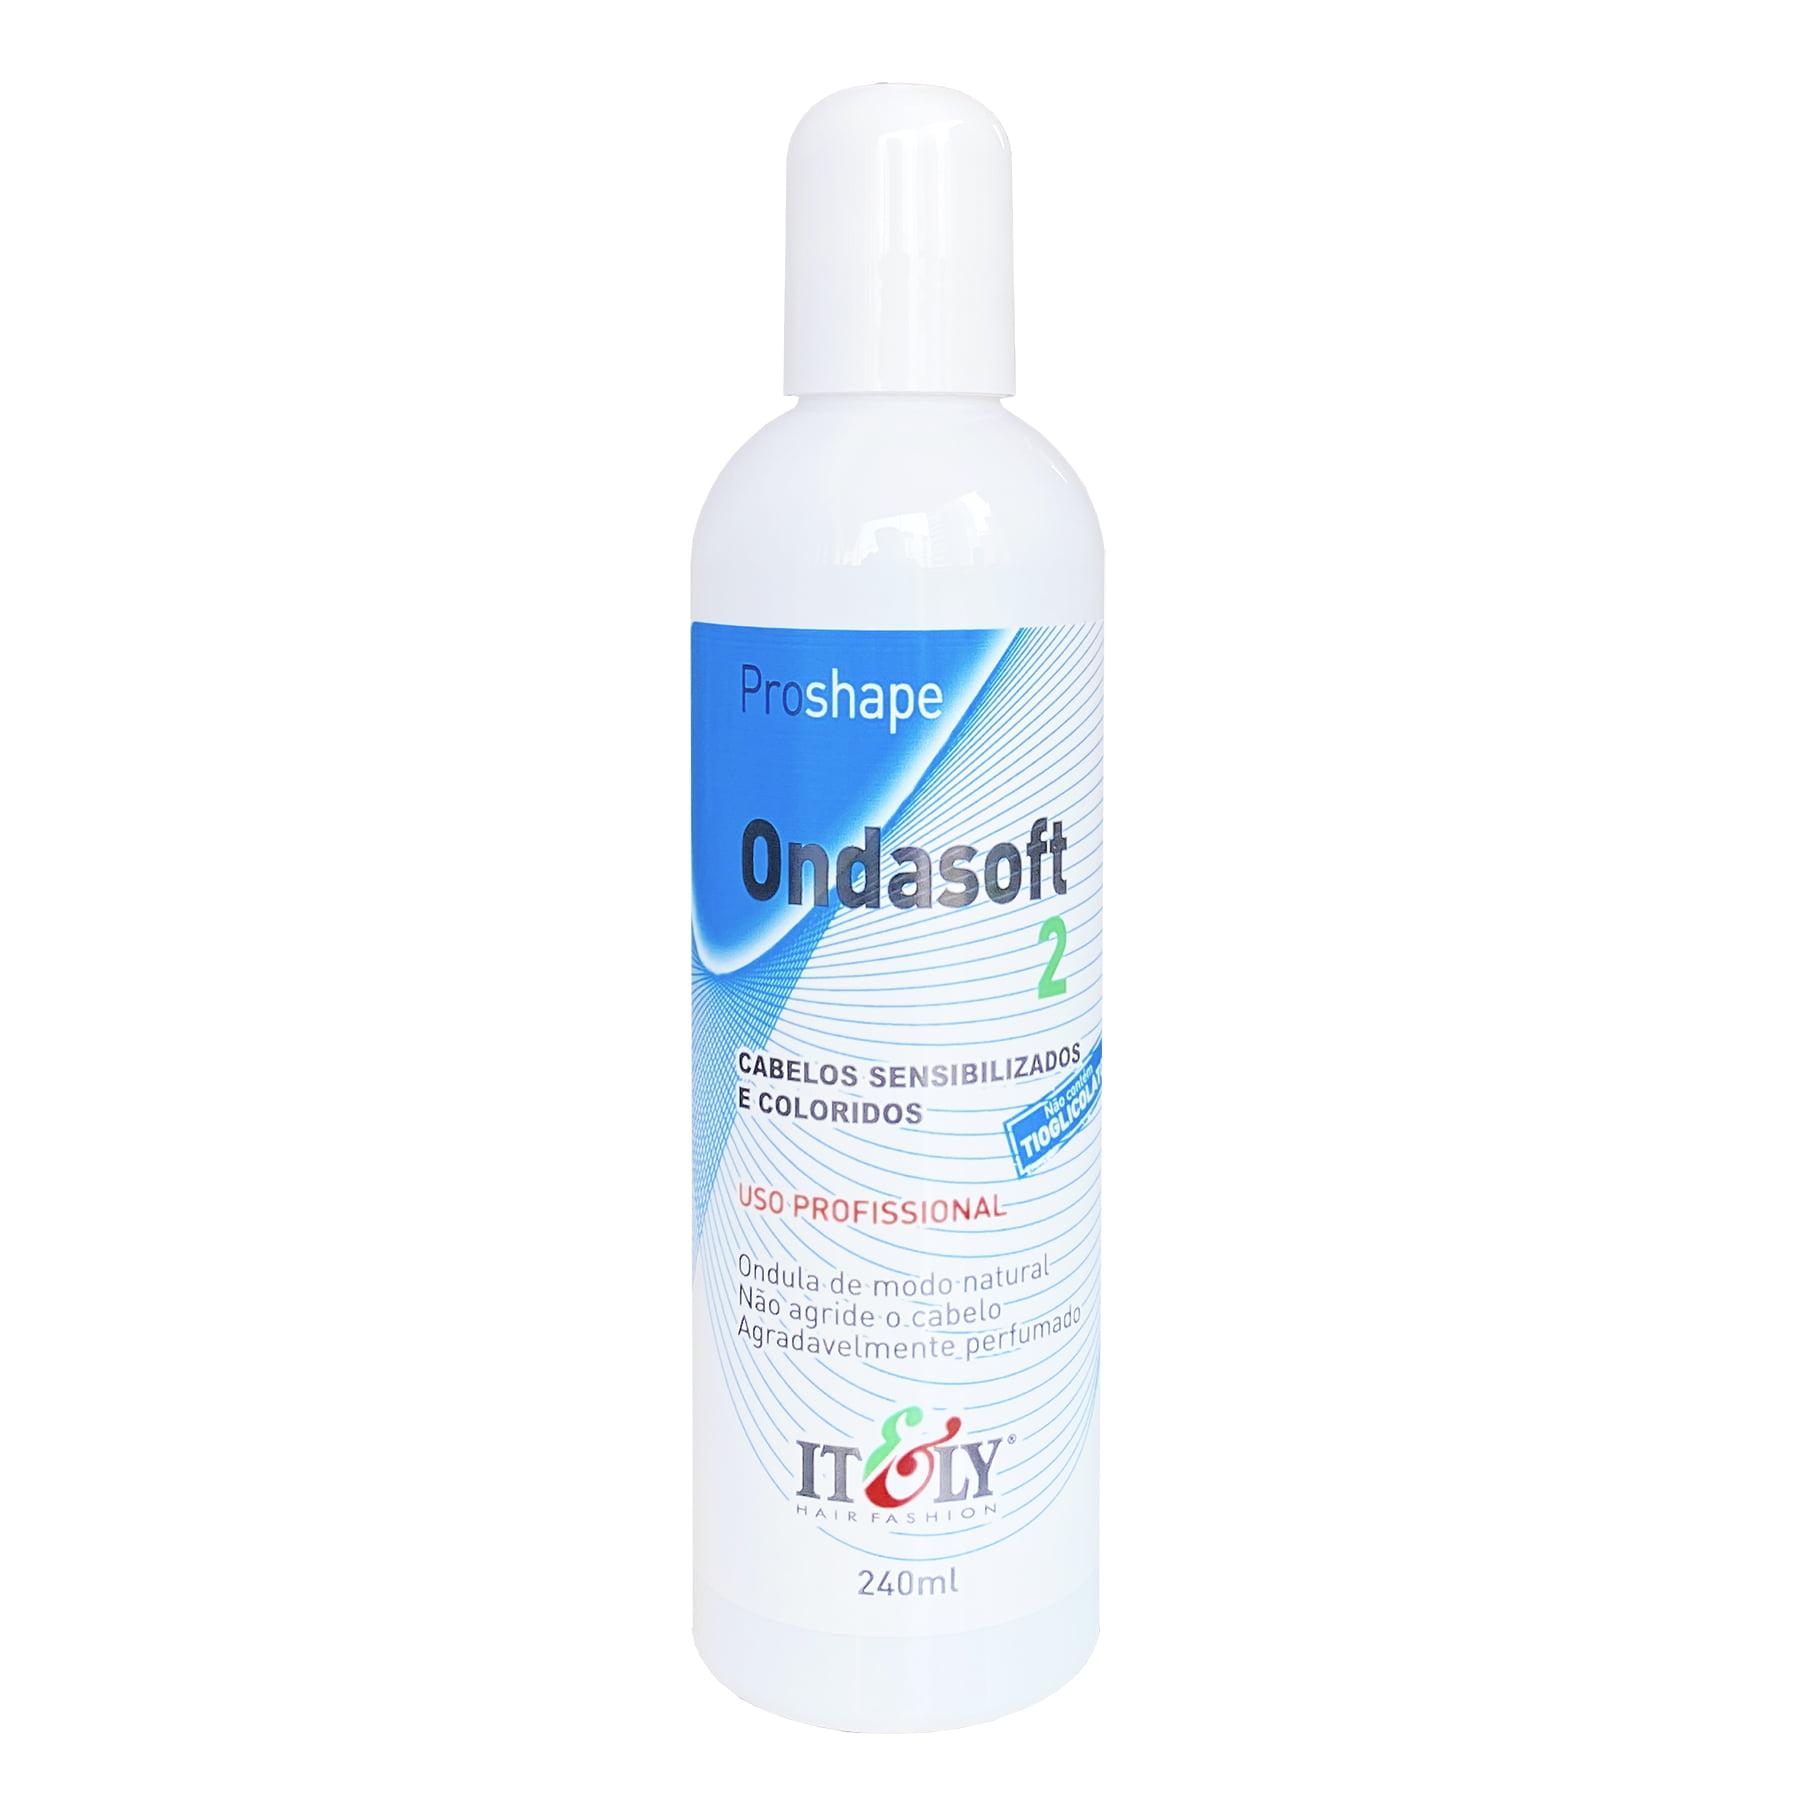 Líquido Permanente Ondasoft Itely 2 - Cabelo Sensibilizados e Coloridos